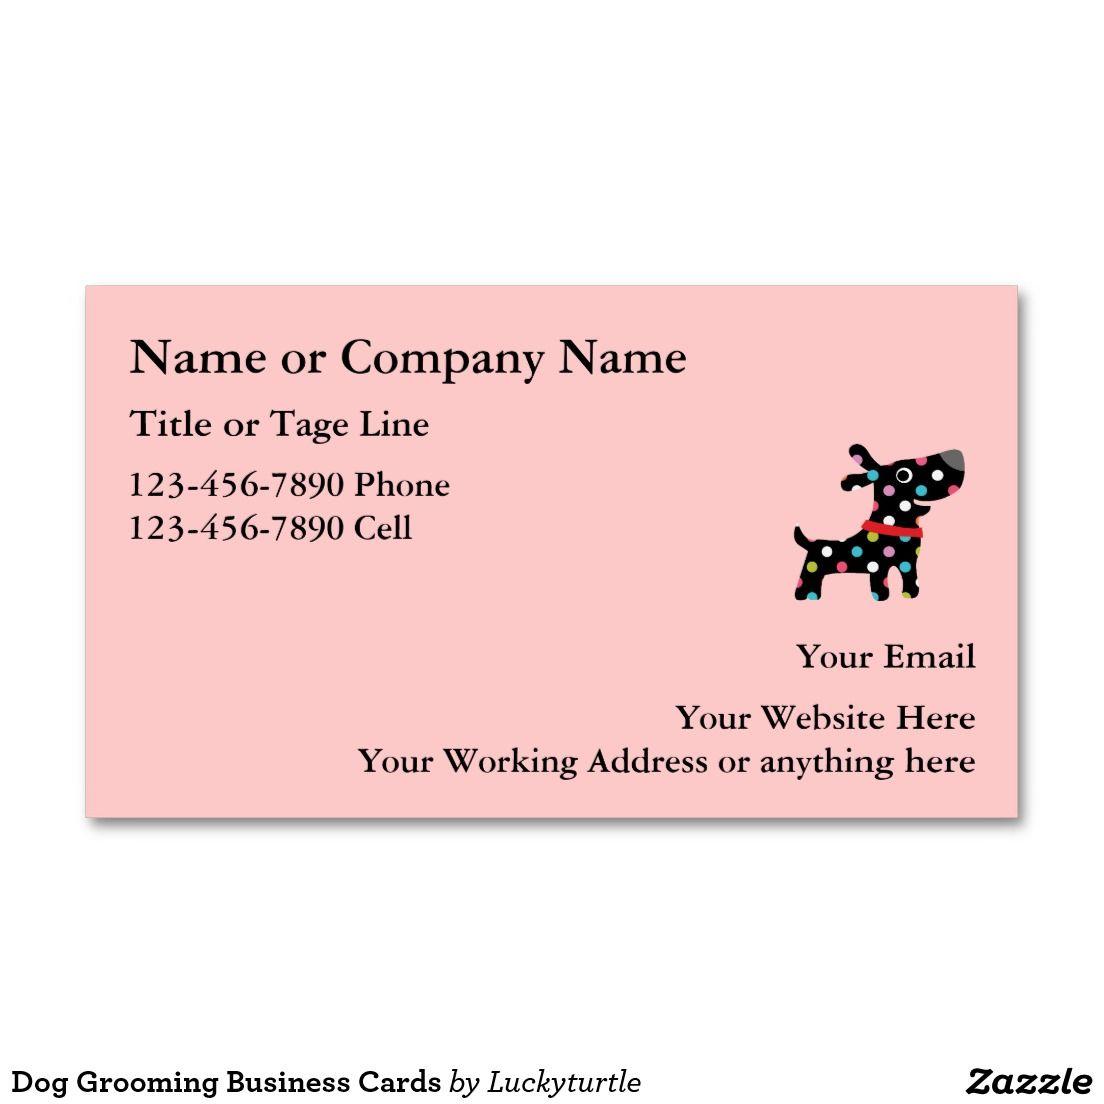 Dog Grooming Business Cards | Art Printmaking | Pinterest ...